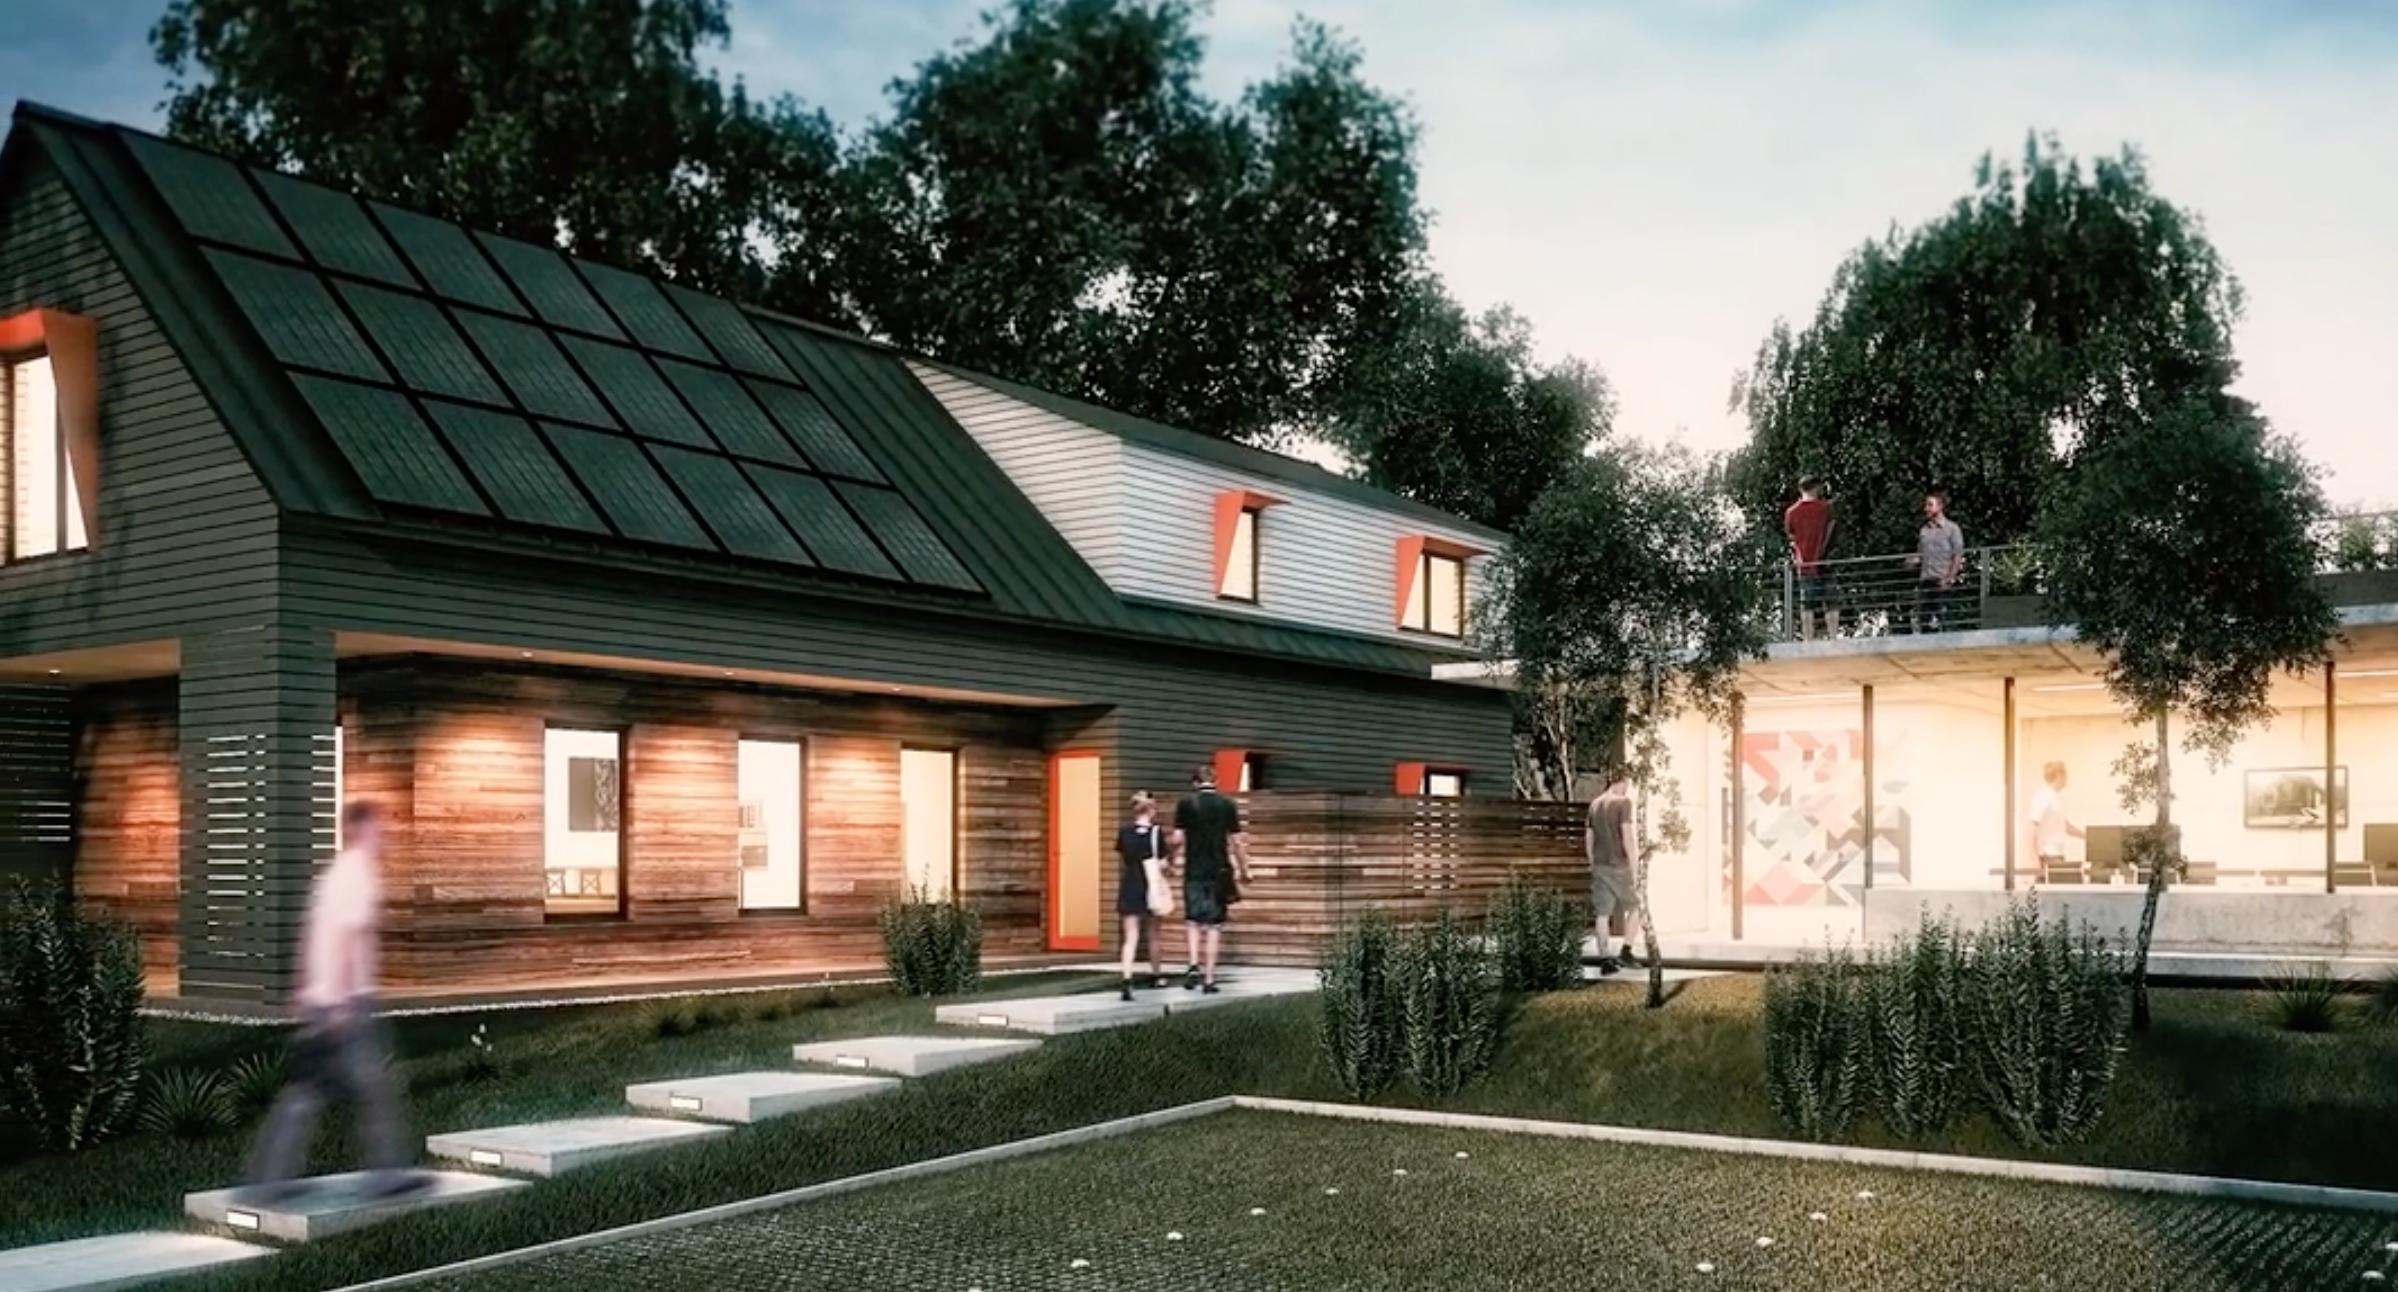 30 acre designs